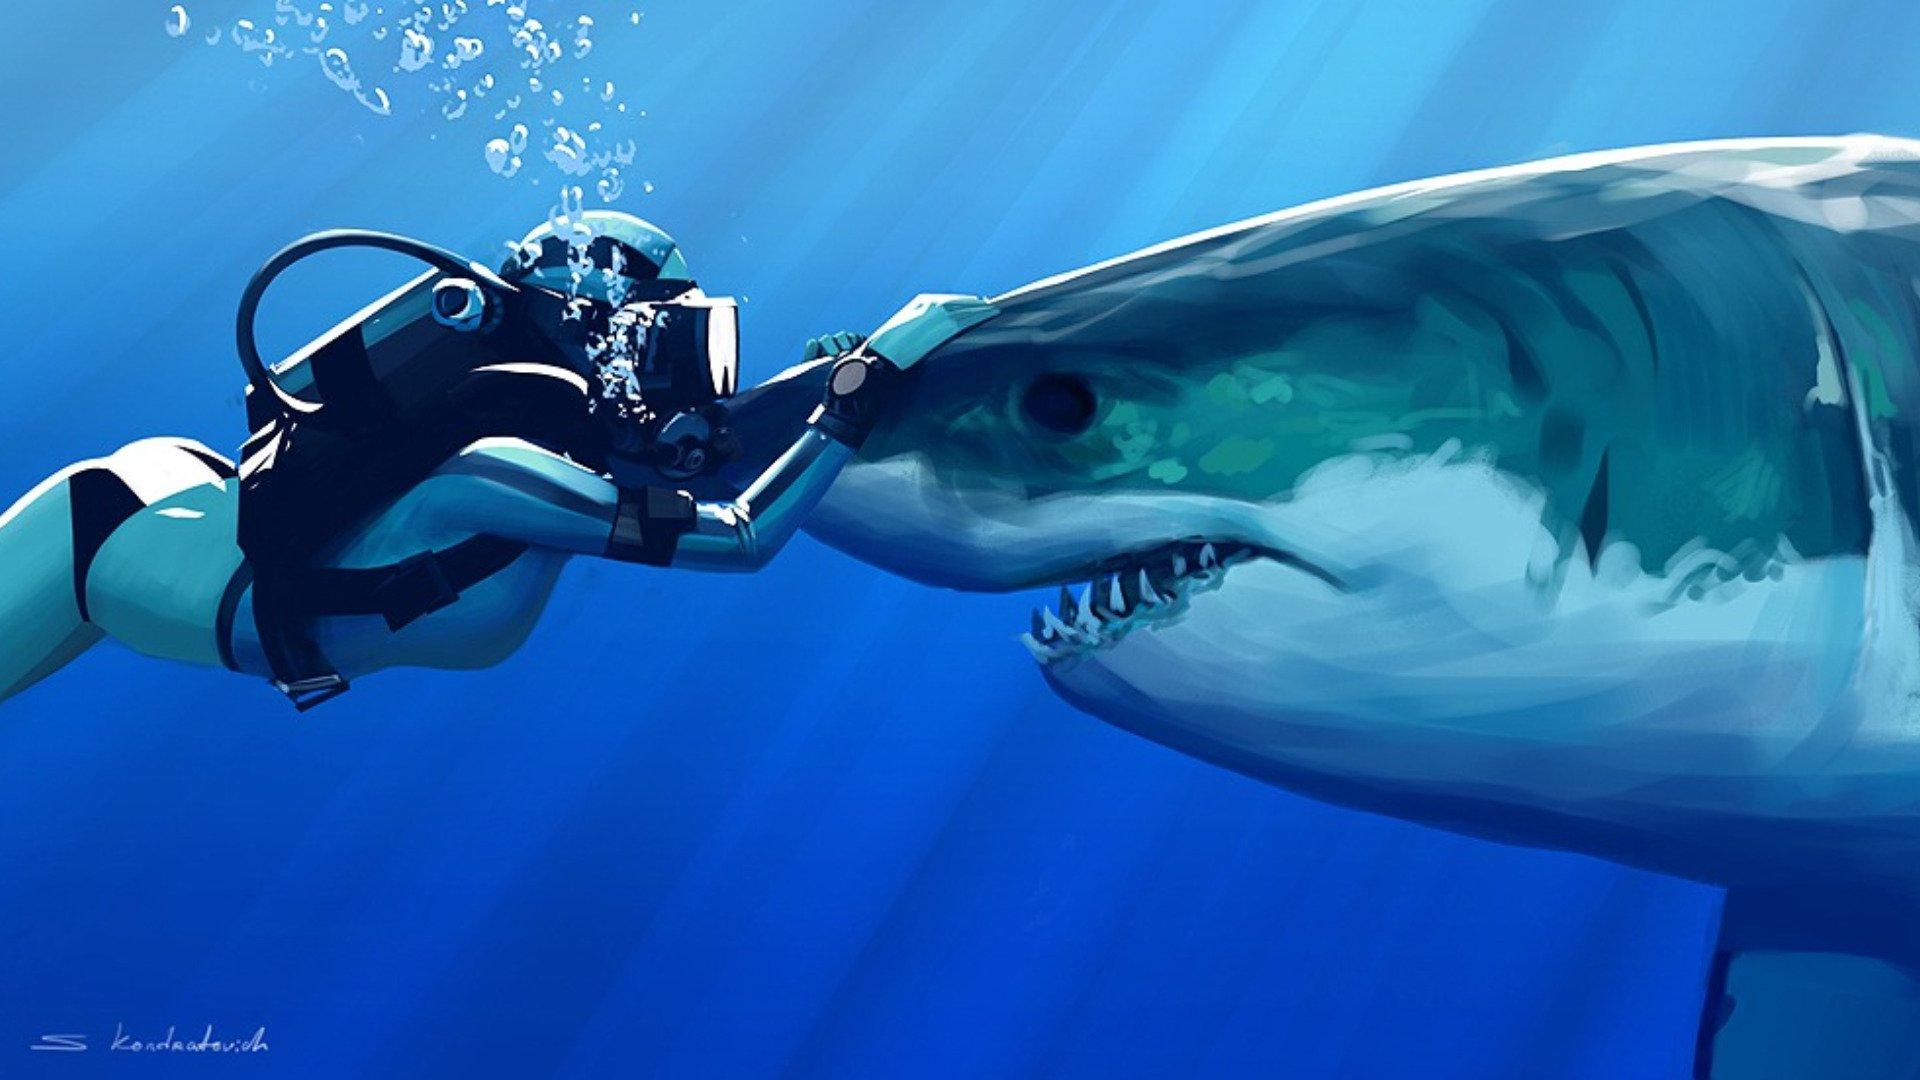 Bureau De Requin Fond D Ecran K Pek 1920x1080 Wallpapertip